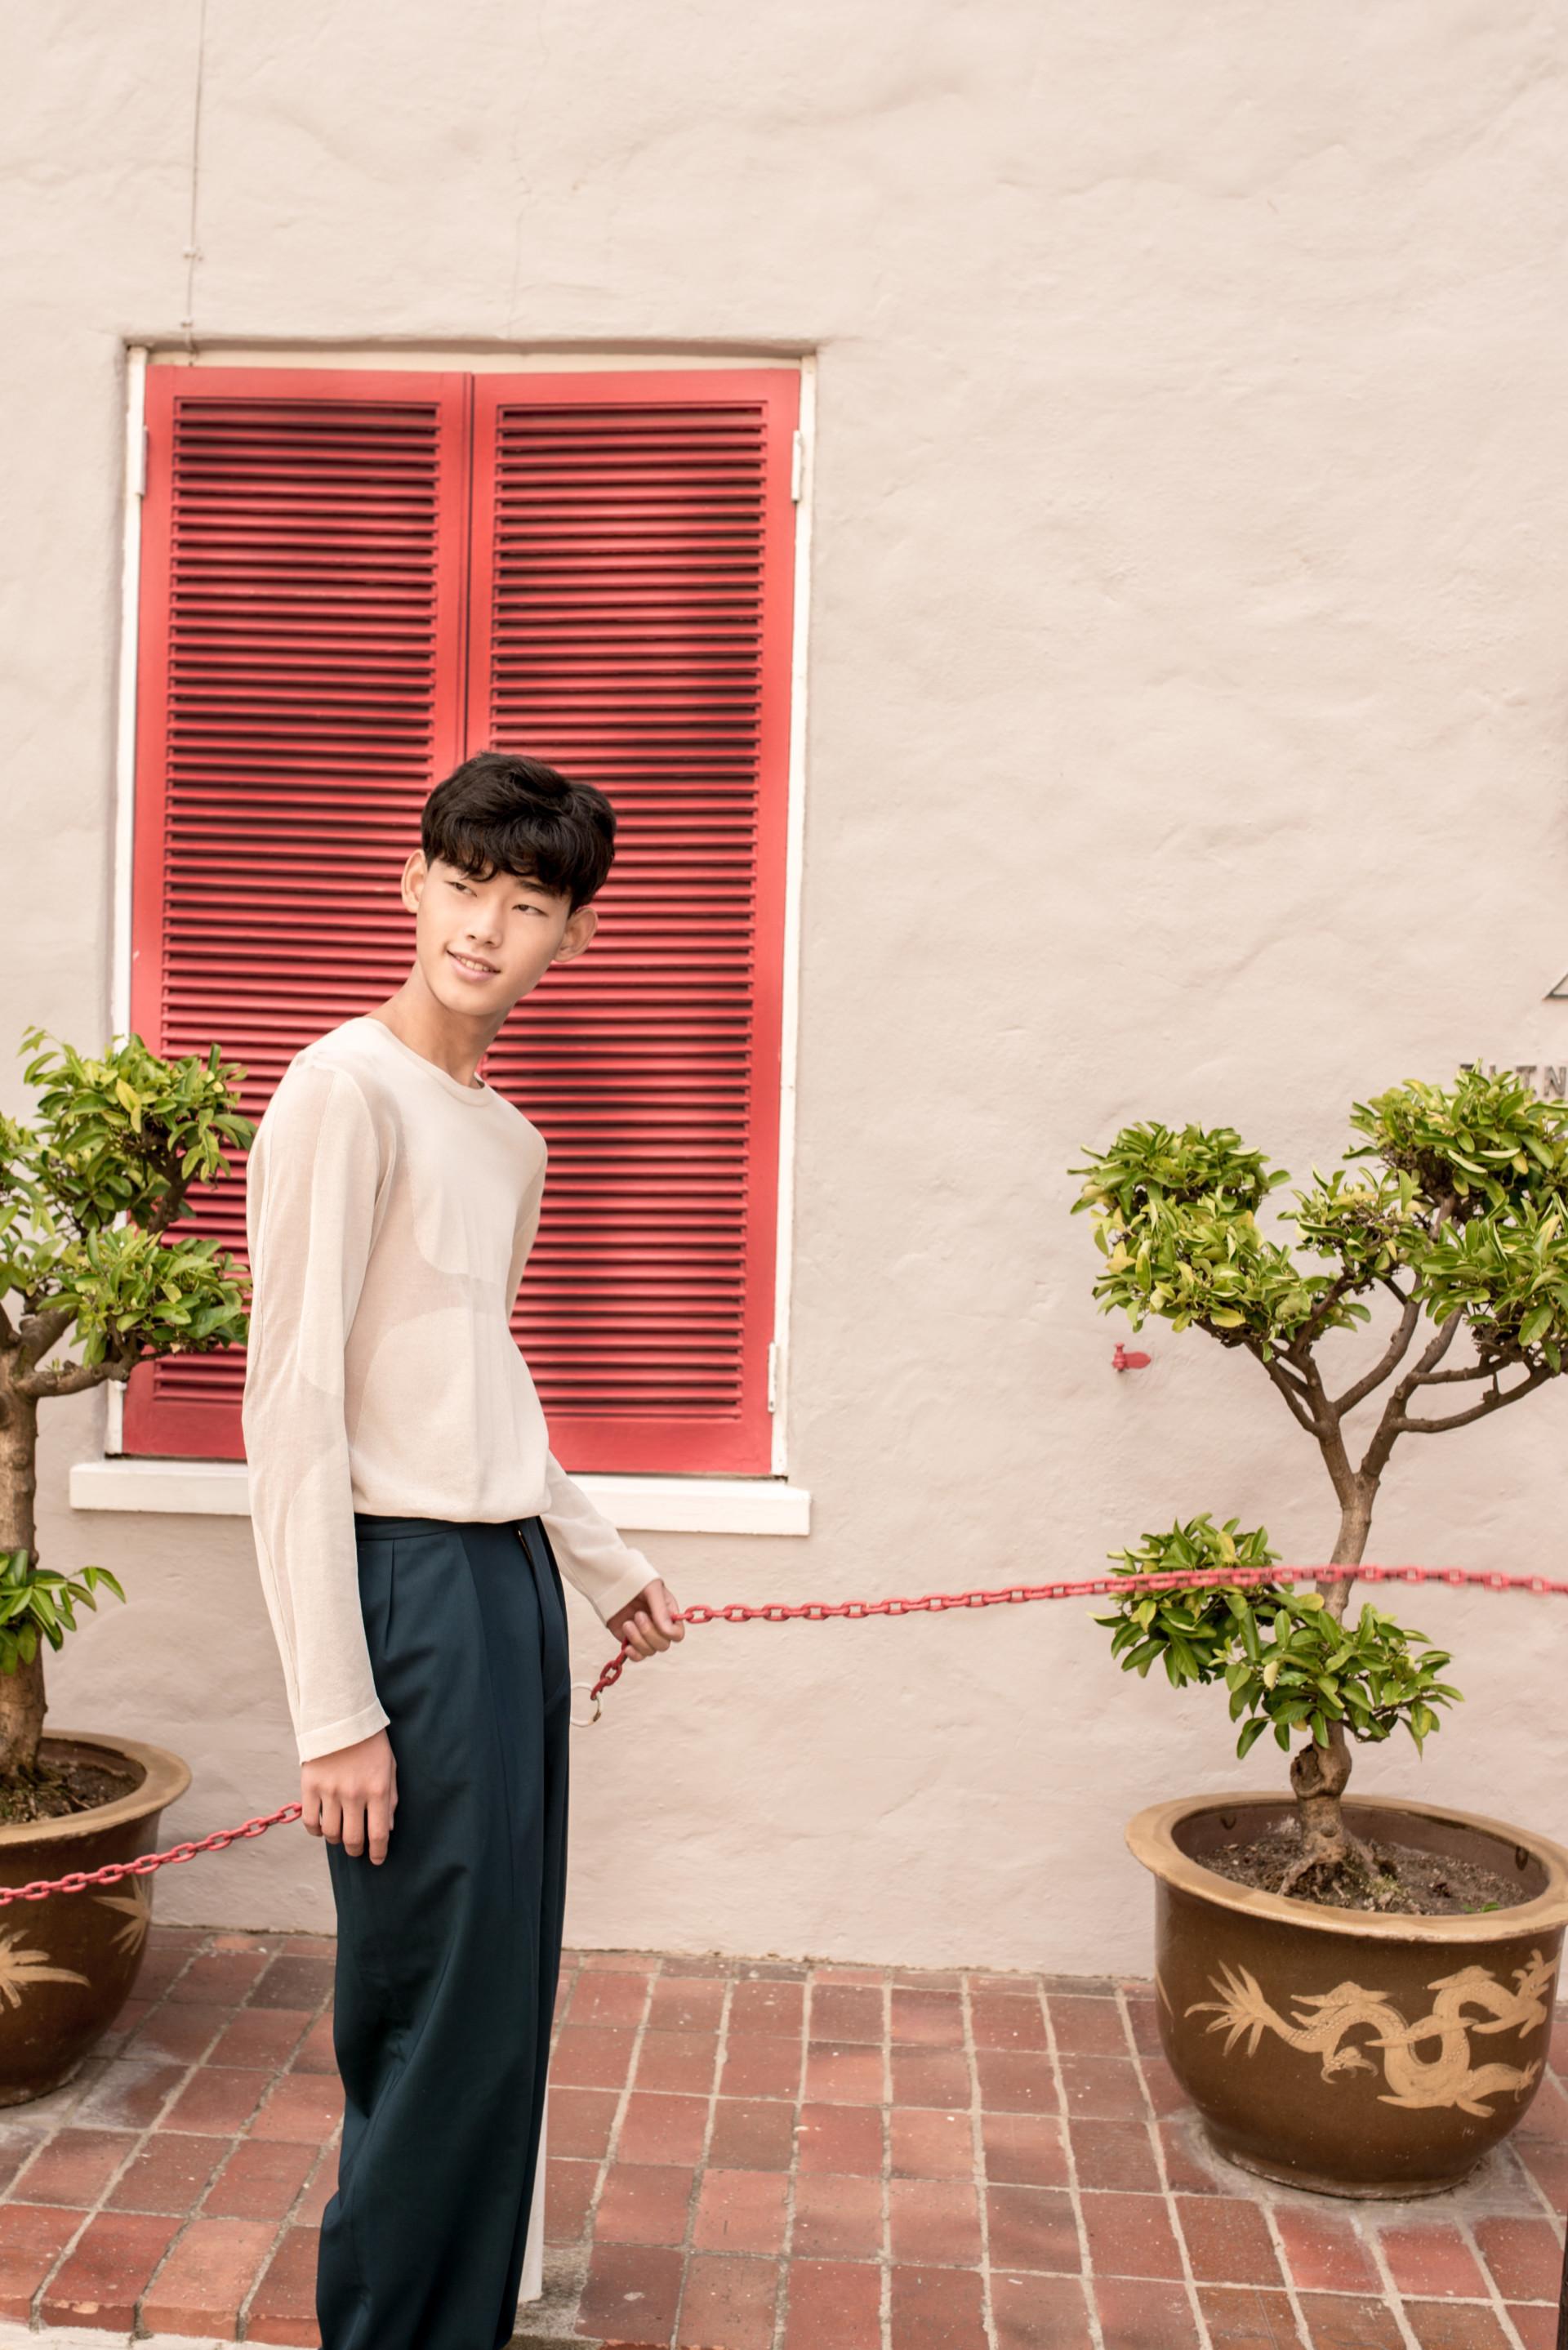 WOLEJKO-WOLEJSZO Elle Men HK Issue with Jae from Twenty Modelmanagement